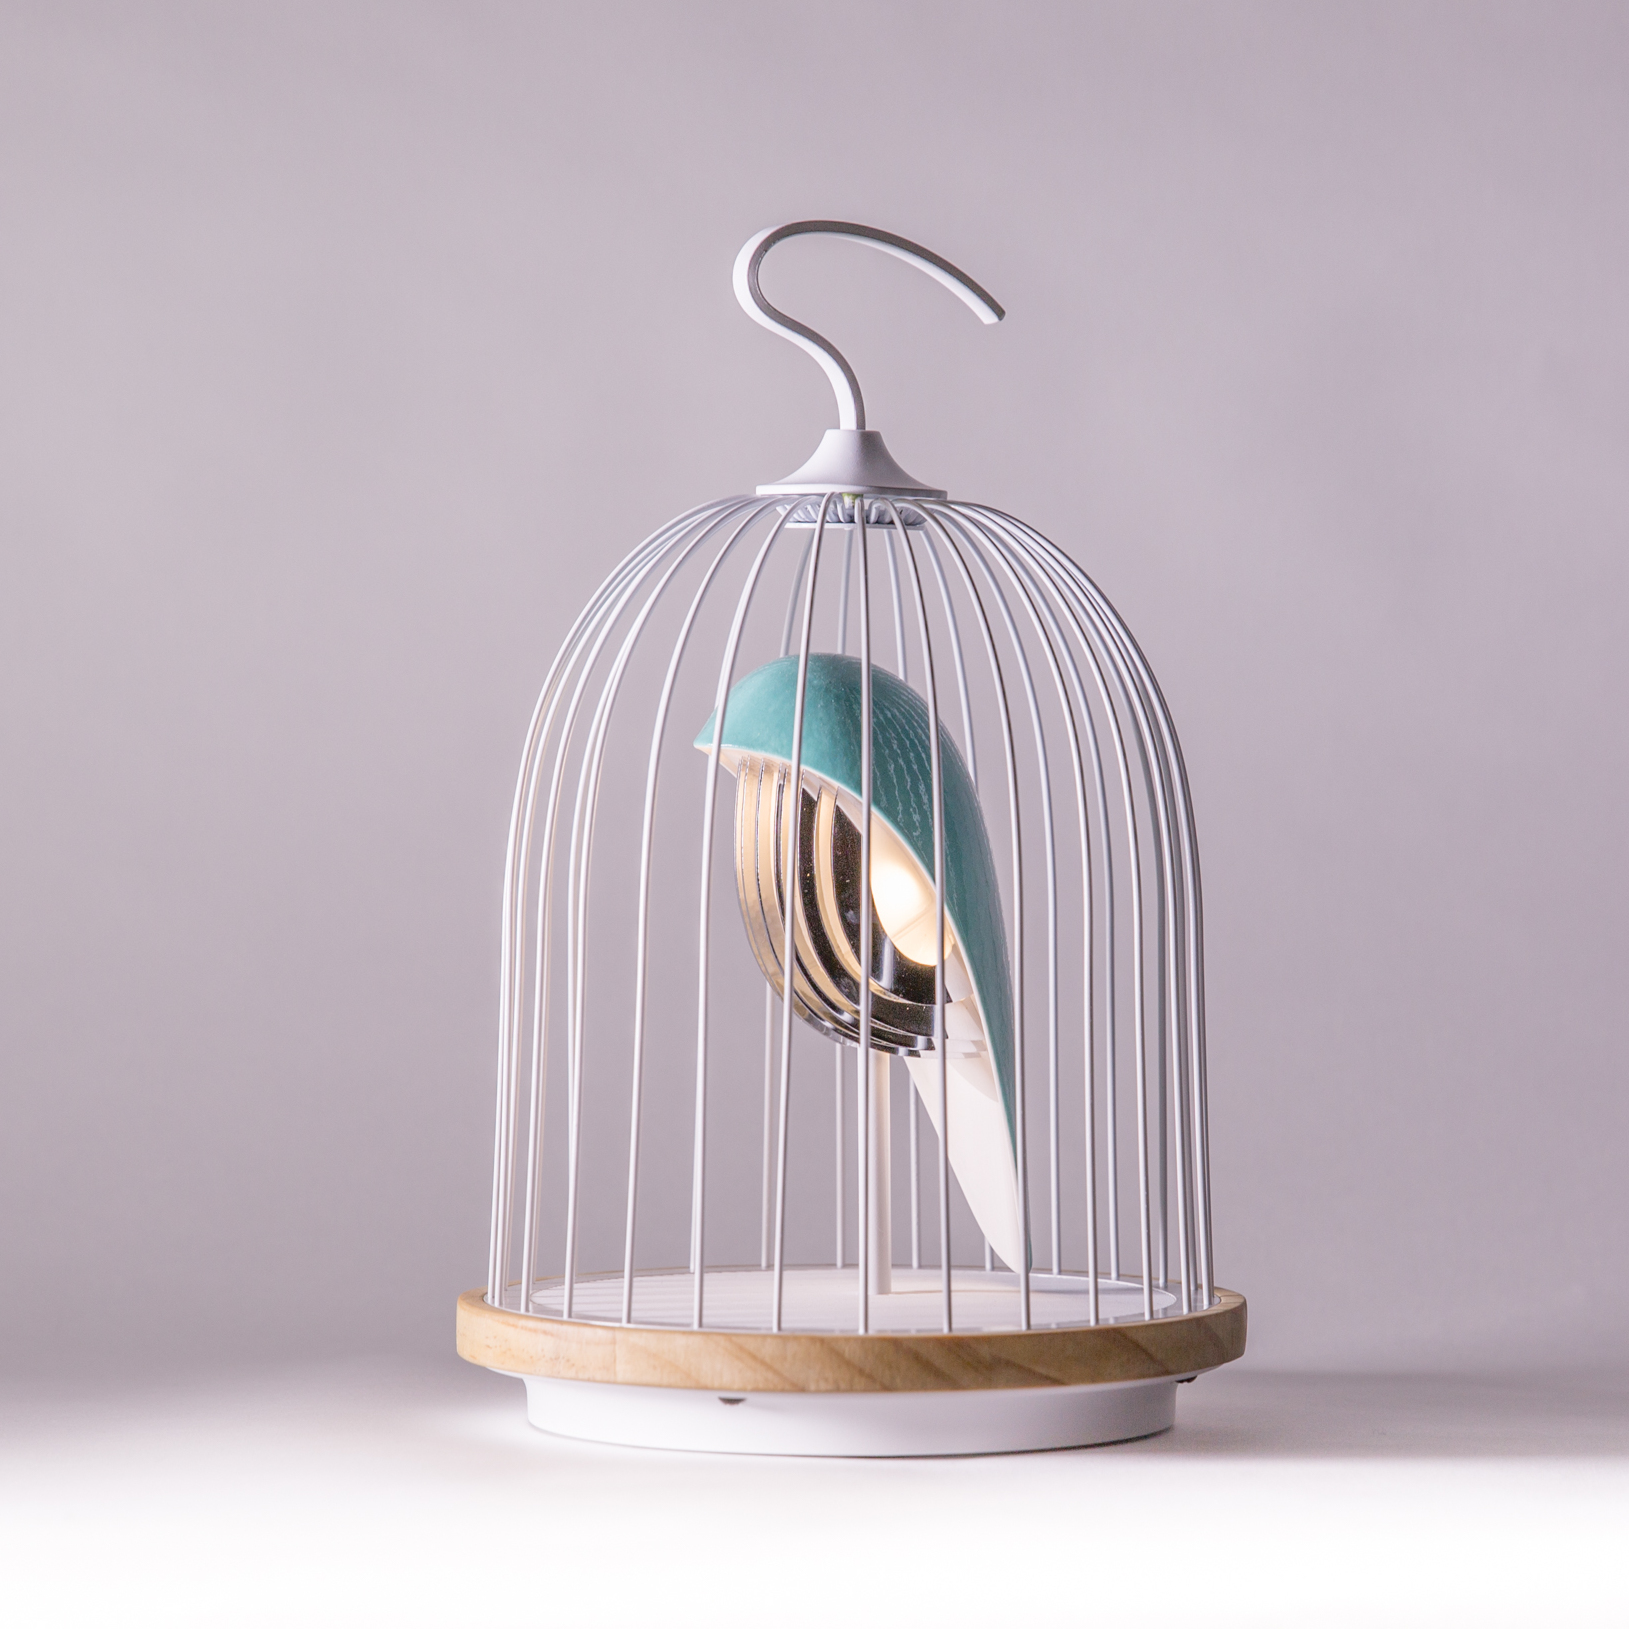 JINGOO - L\'Oiseau Bleu